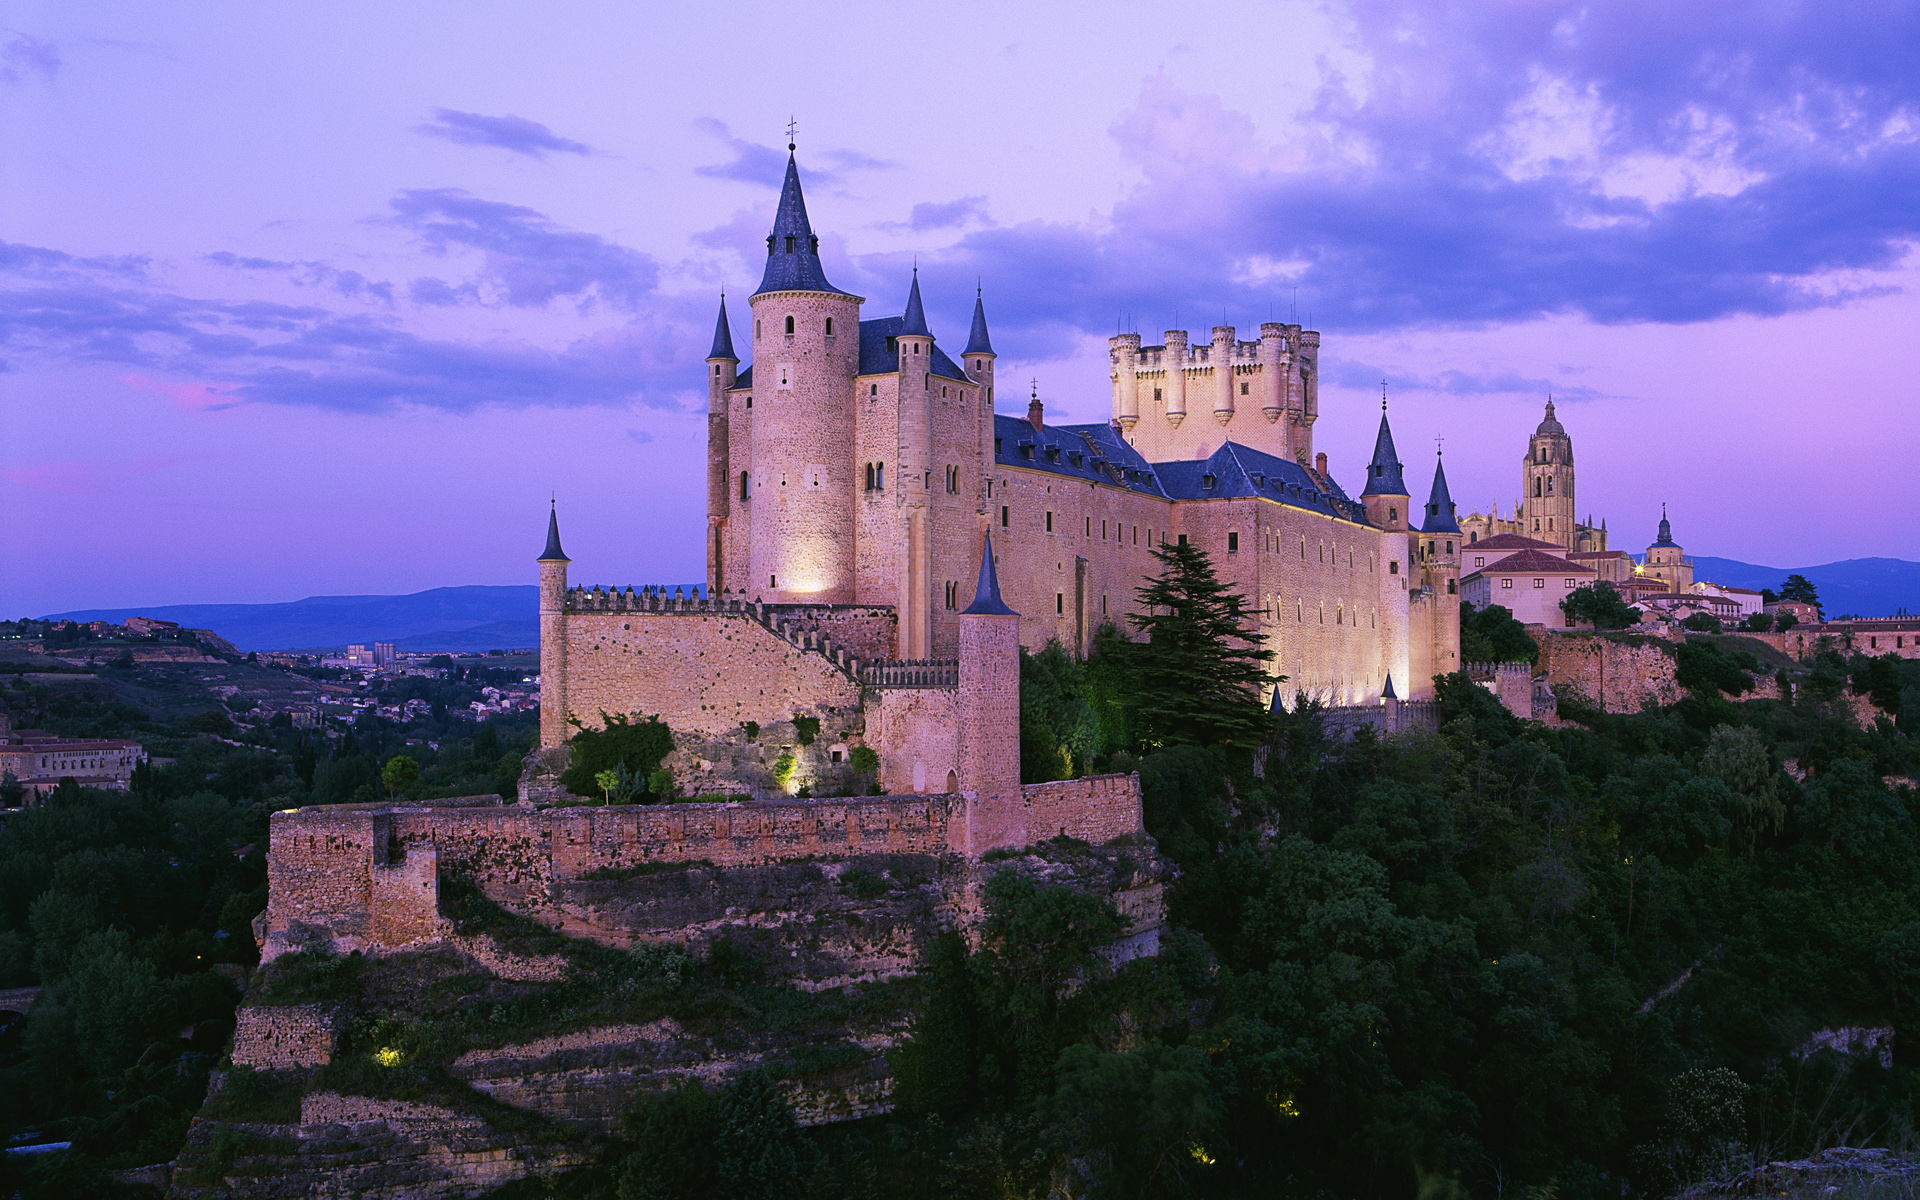 https://i0.wp.com/www.medievalarchives.com/wp-content/uploads/2011/07/7castle_spain.jpg